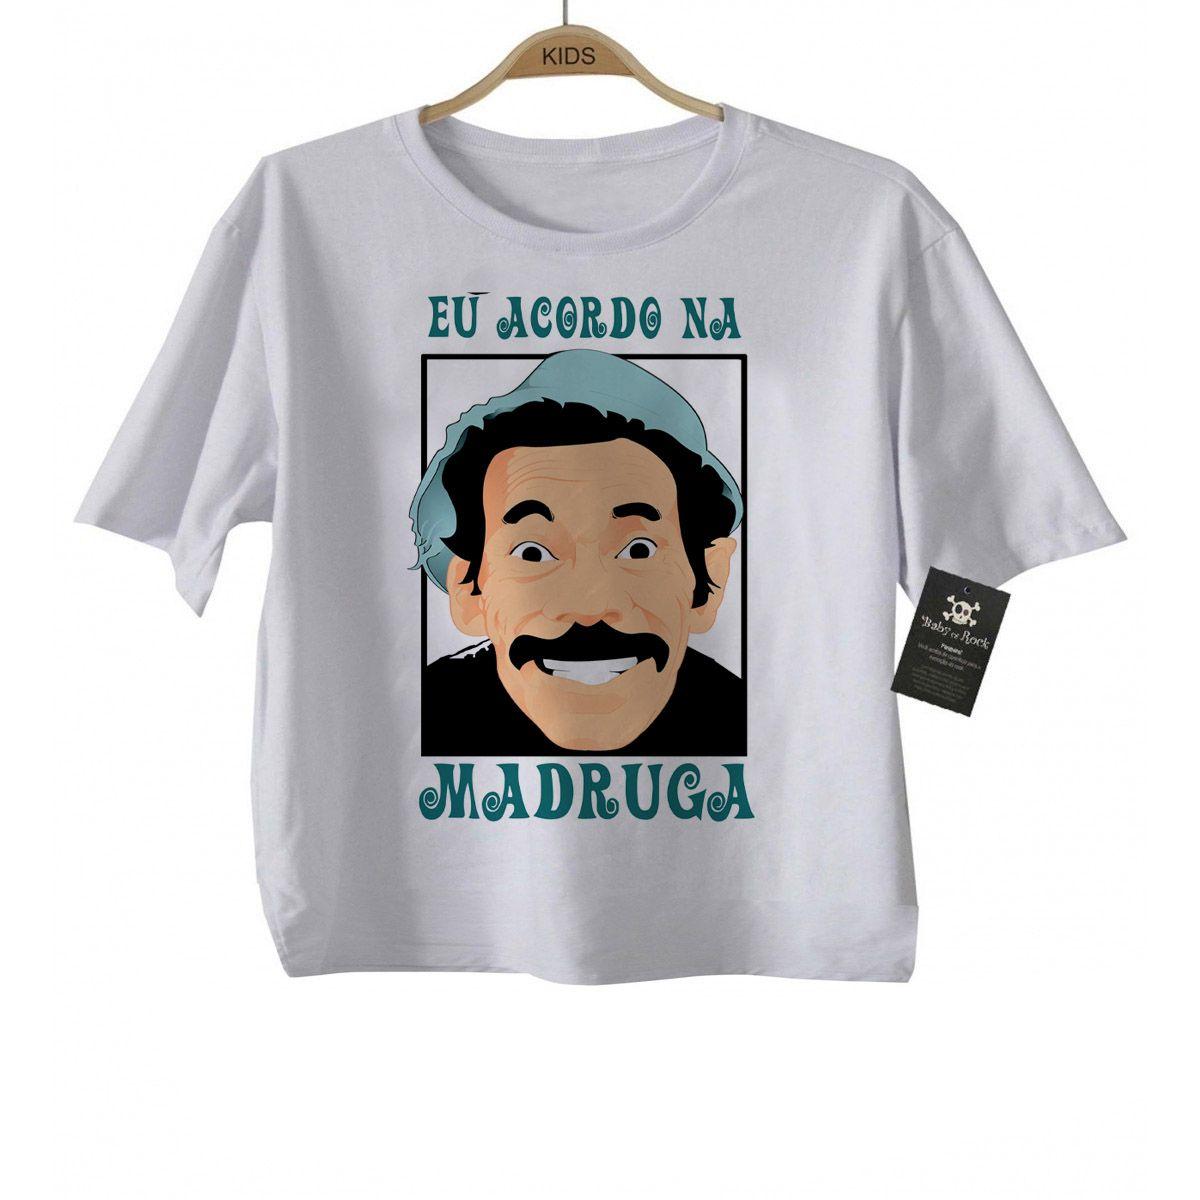 Camiseta  Infantil Divertida - Eu acordo na madruga - White  - Baby Monster S/A